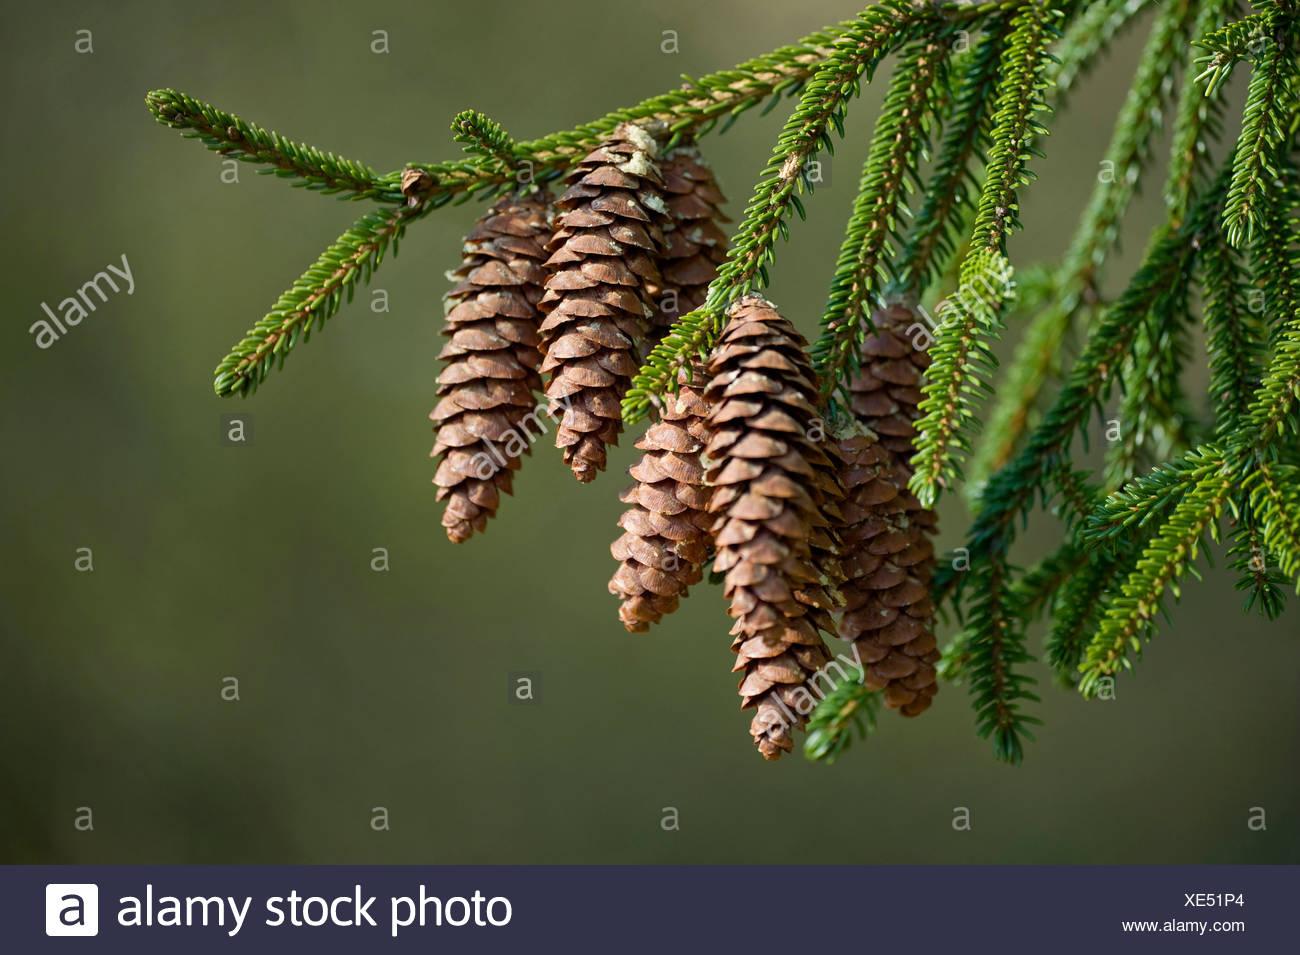 Priental Spruce (Picea orientalis), cones on a branch - Stock Image